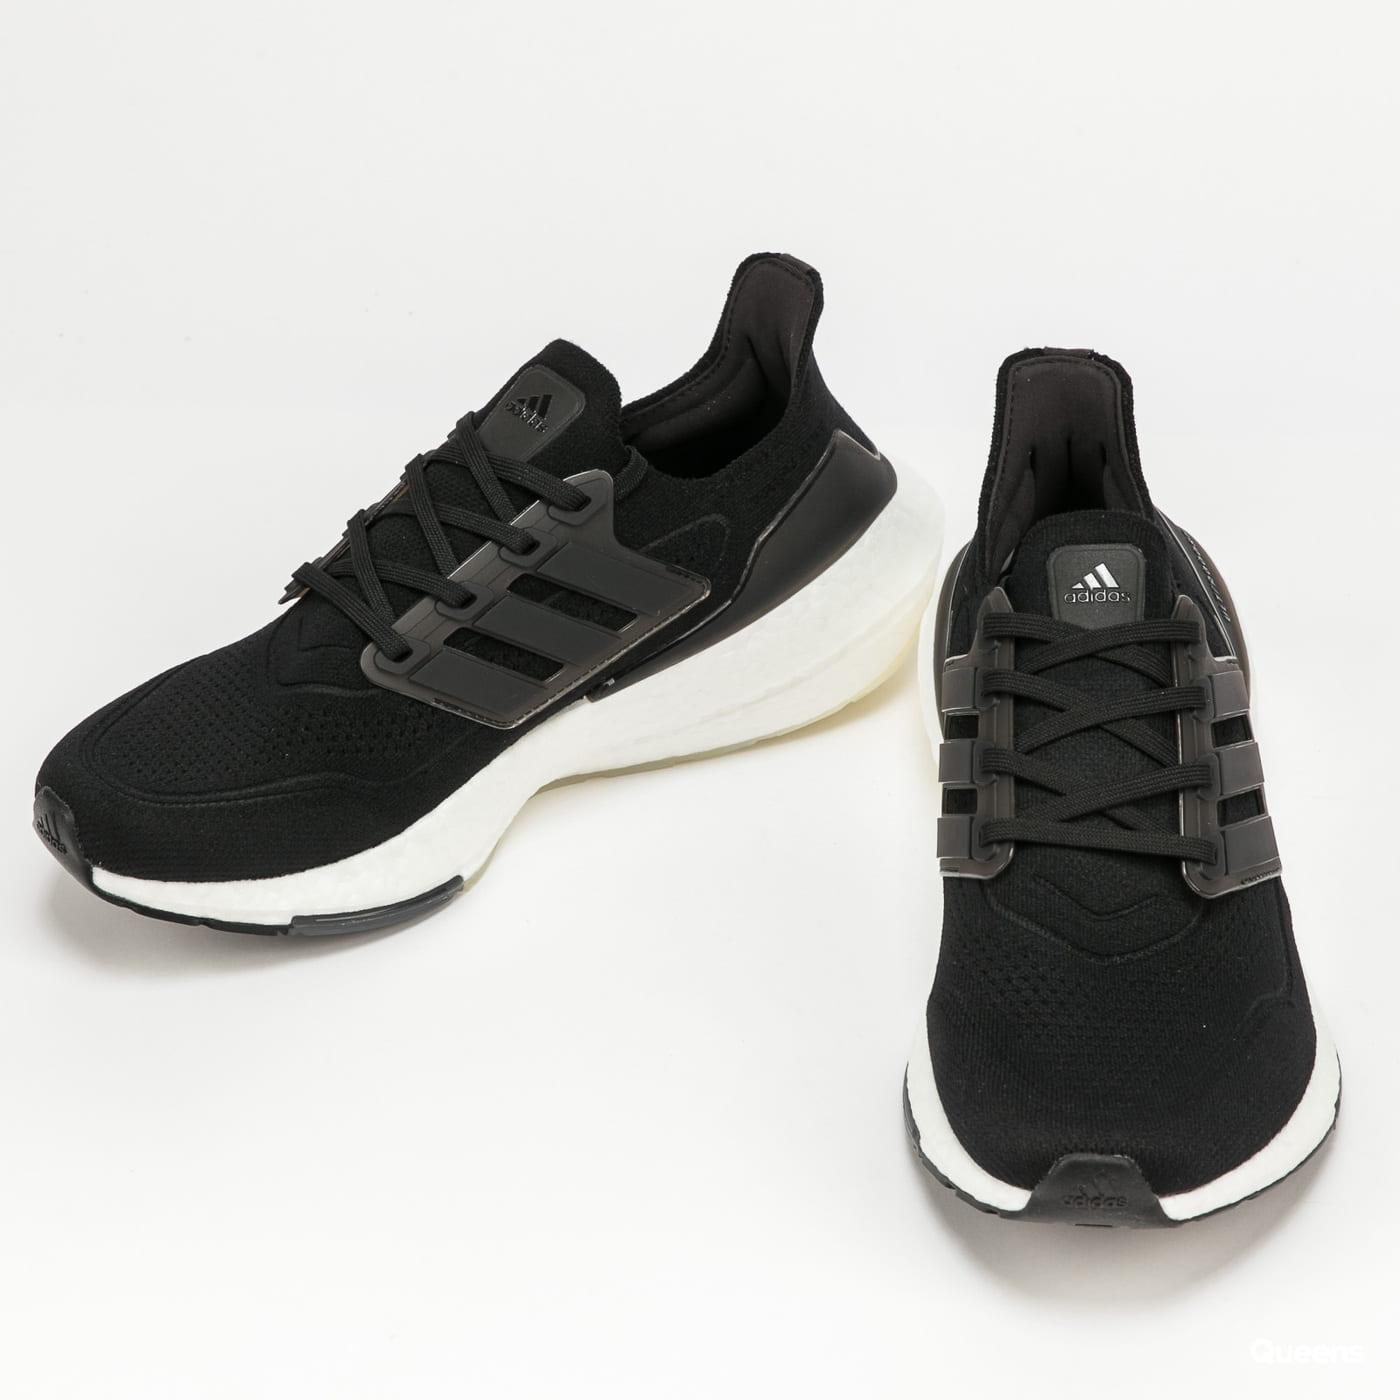 adidas Performance UltraBoost 21 cblack / cblack / grefol